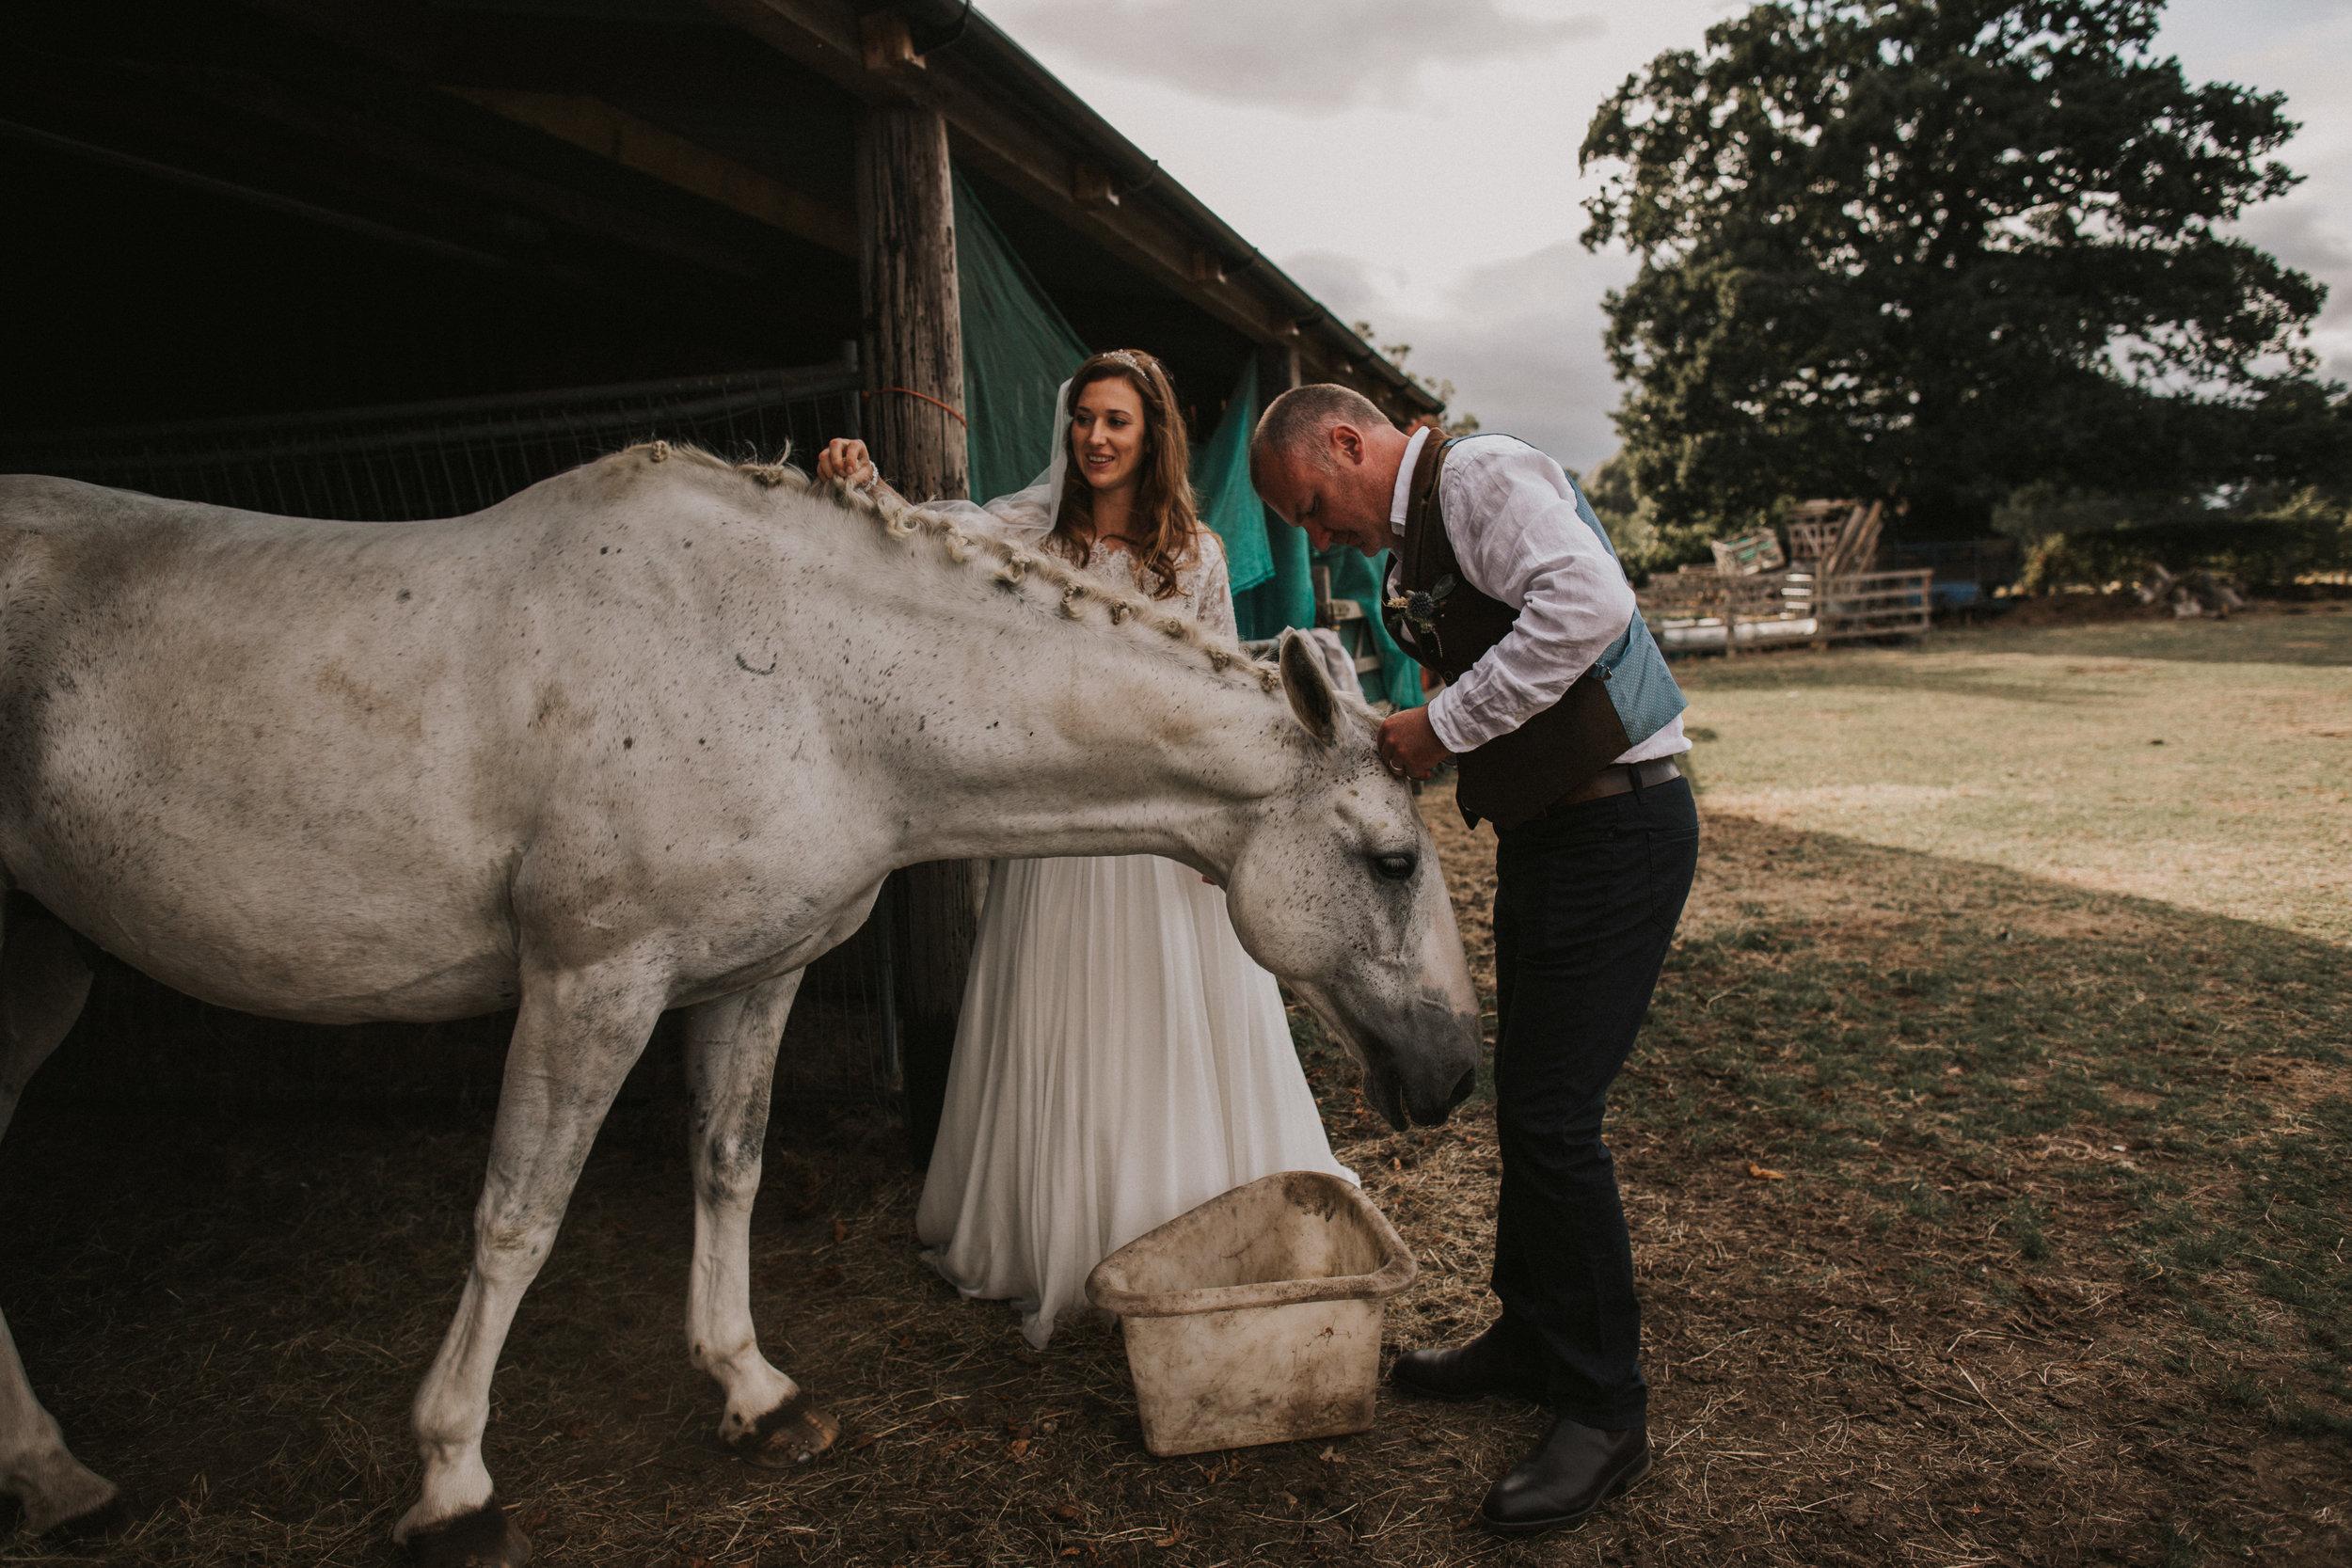 brook rose photography  Farm wedding_81.jpg